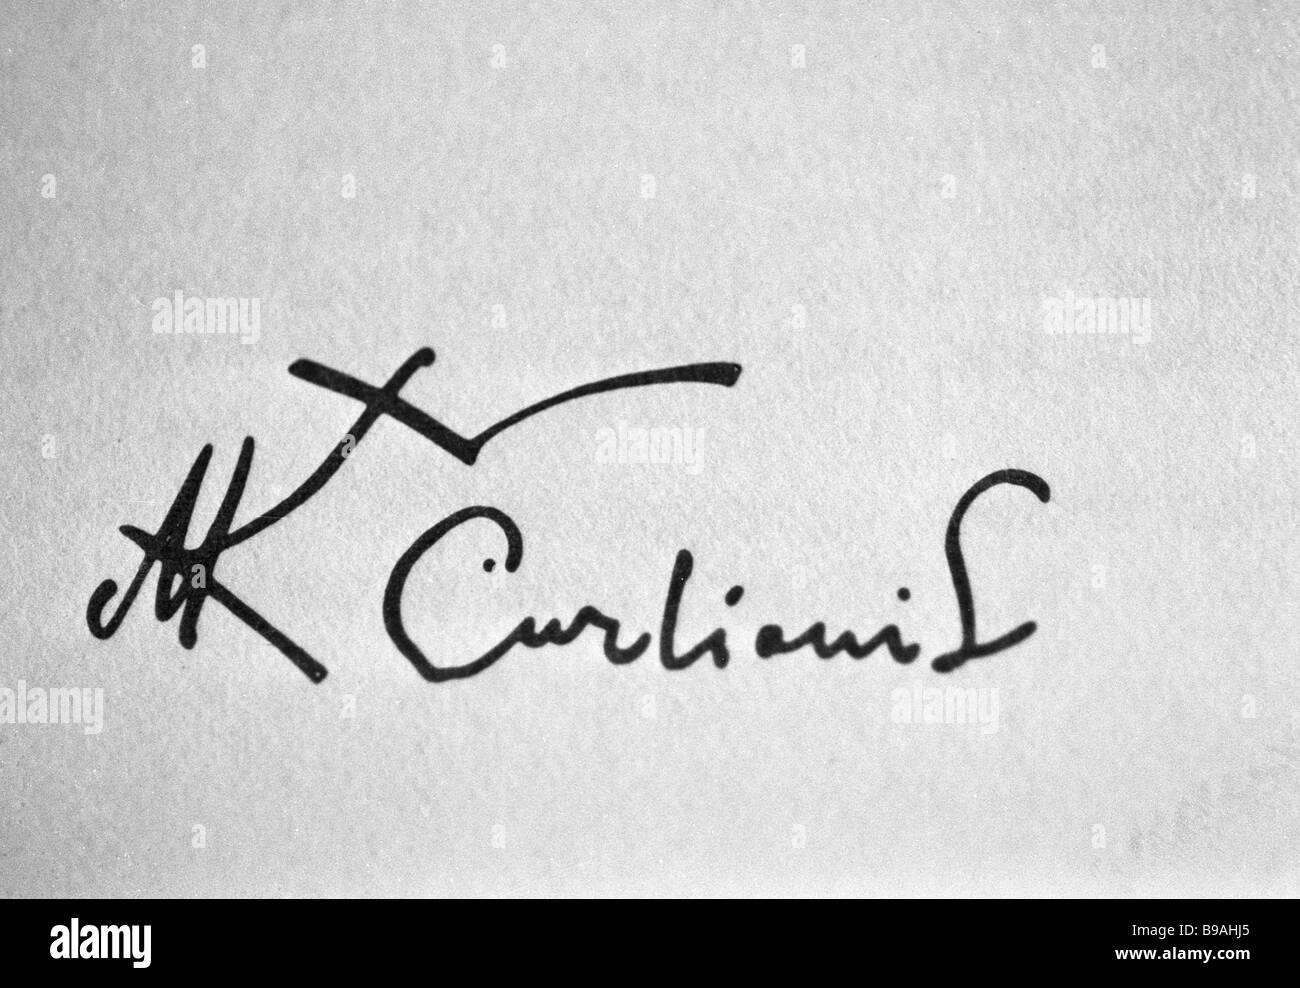 An autograph of Mikalojus Ciurlionis 1875 1911 - Stock Image